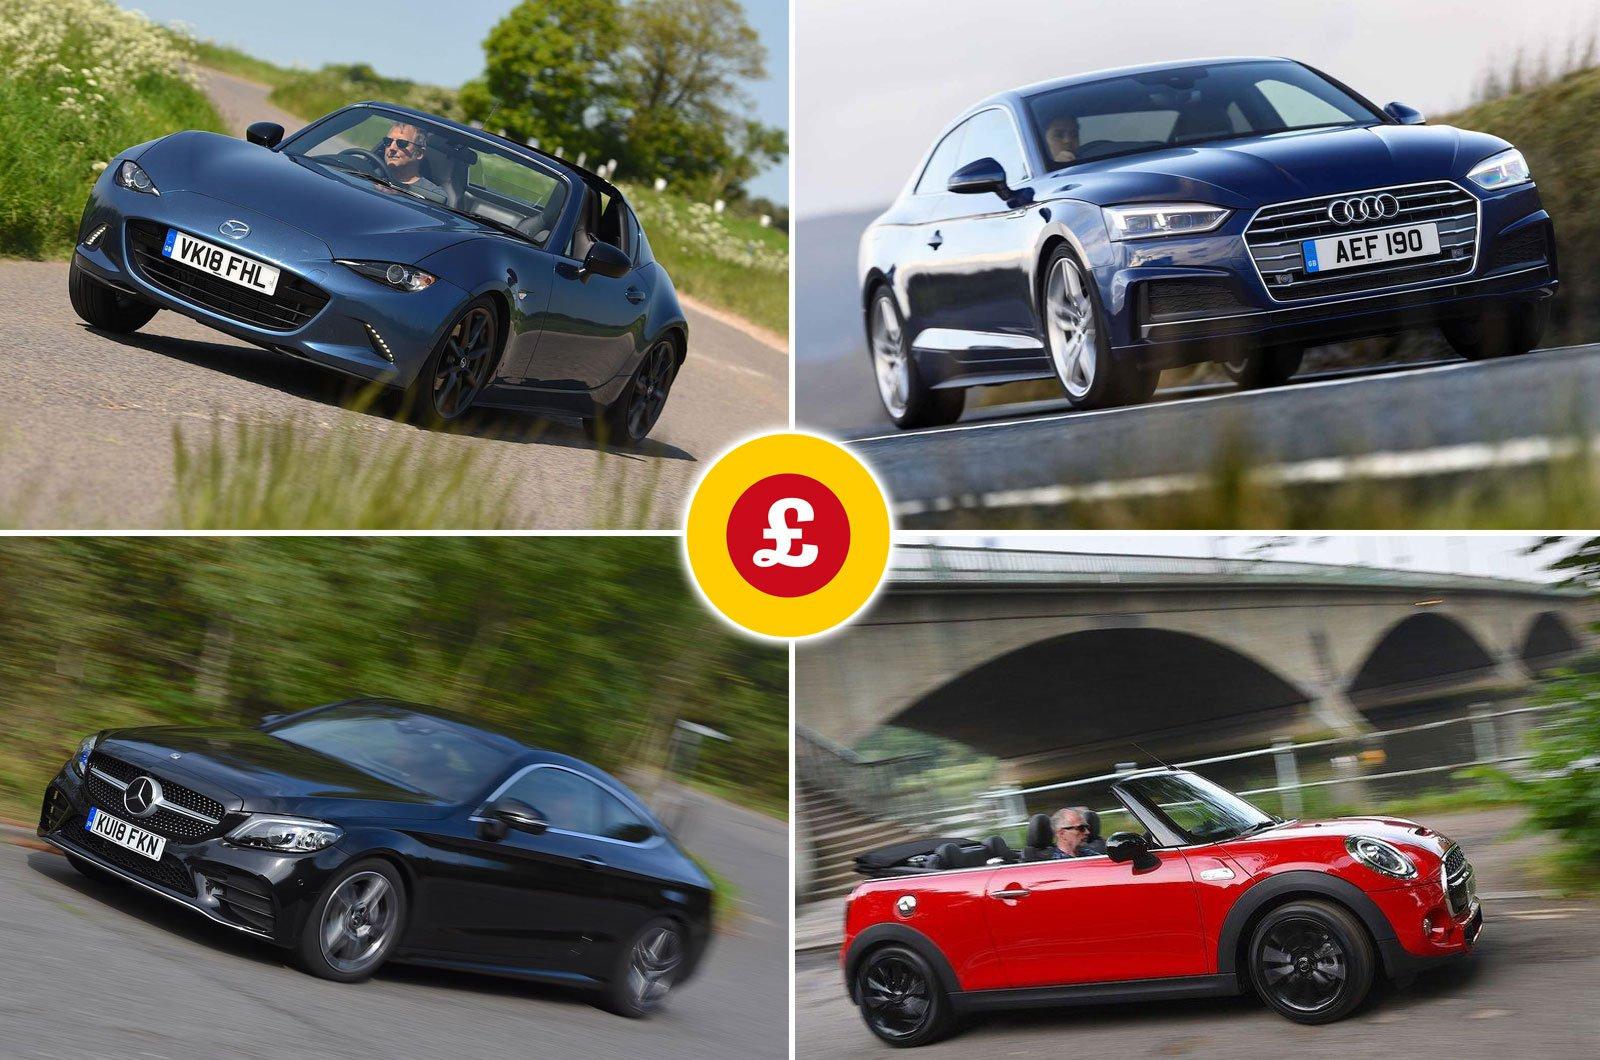 Mazda MX-5 RF, Audi A5, Mercedes C-Class Coupé, Mini Convertible